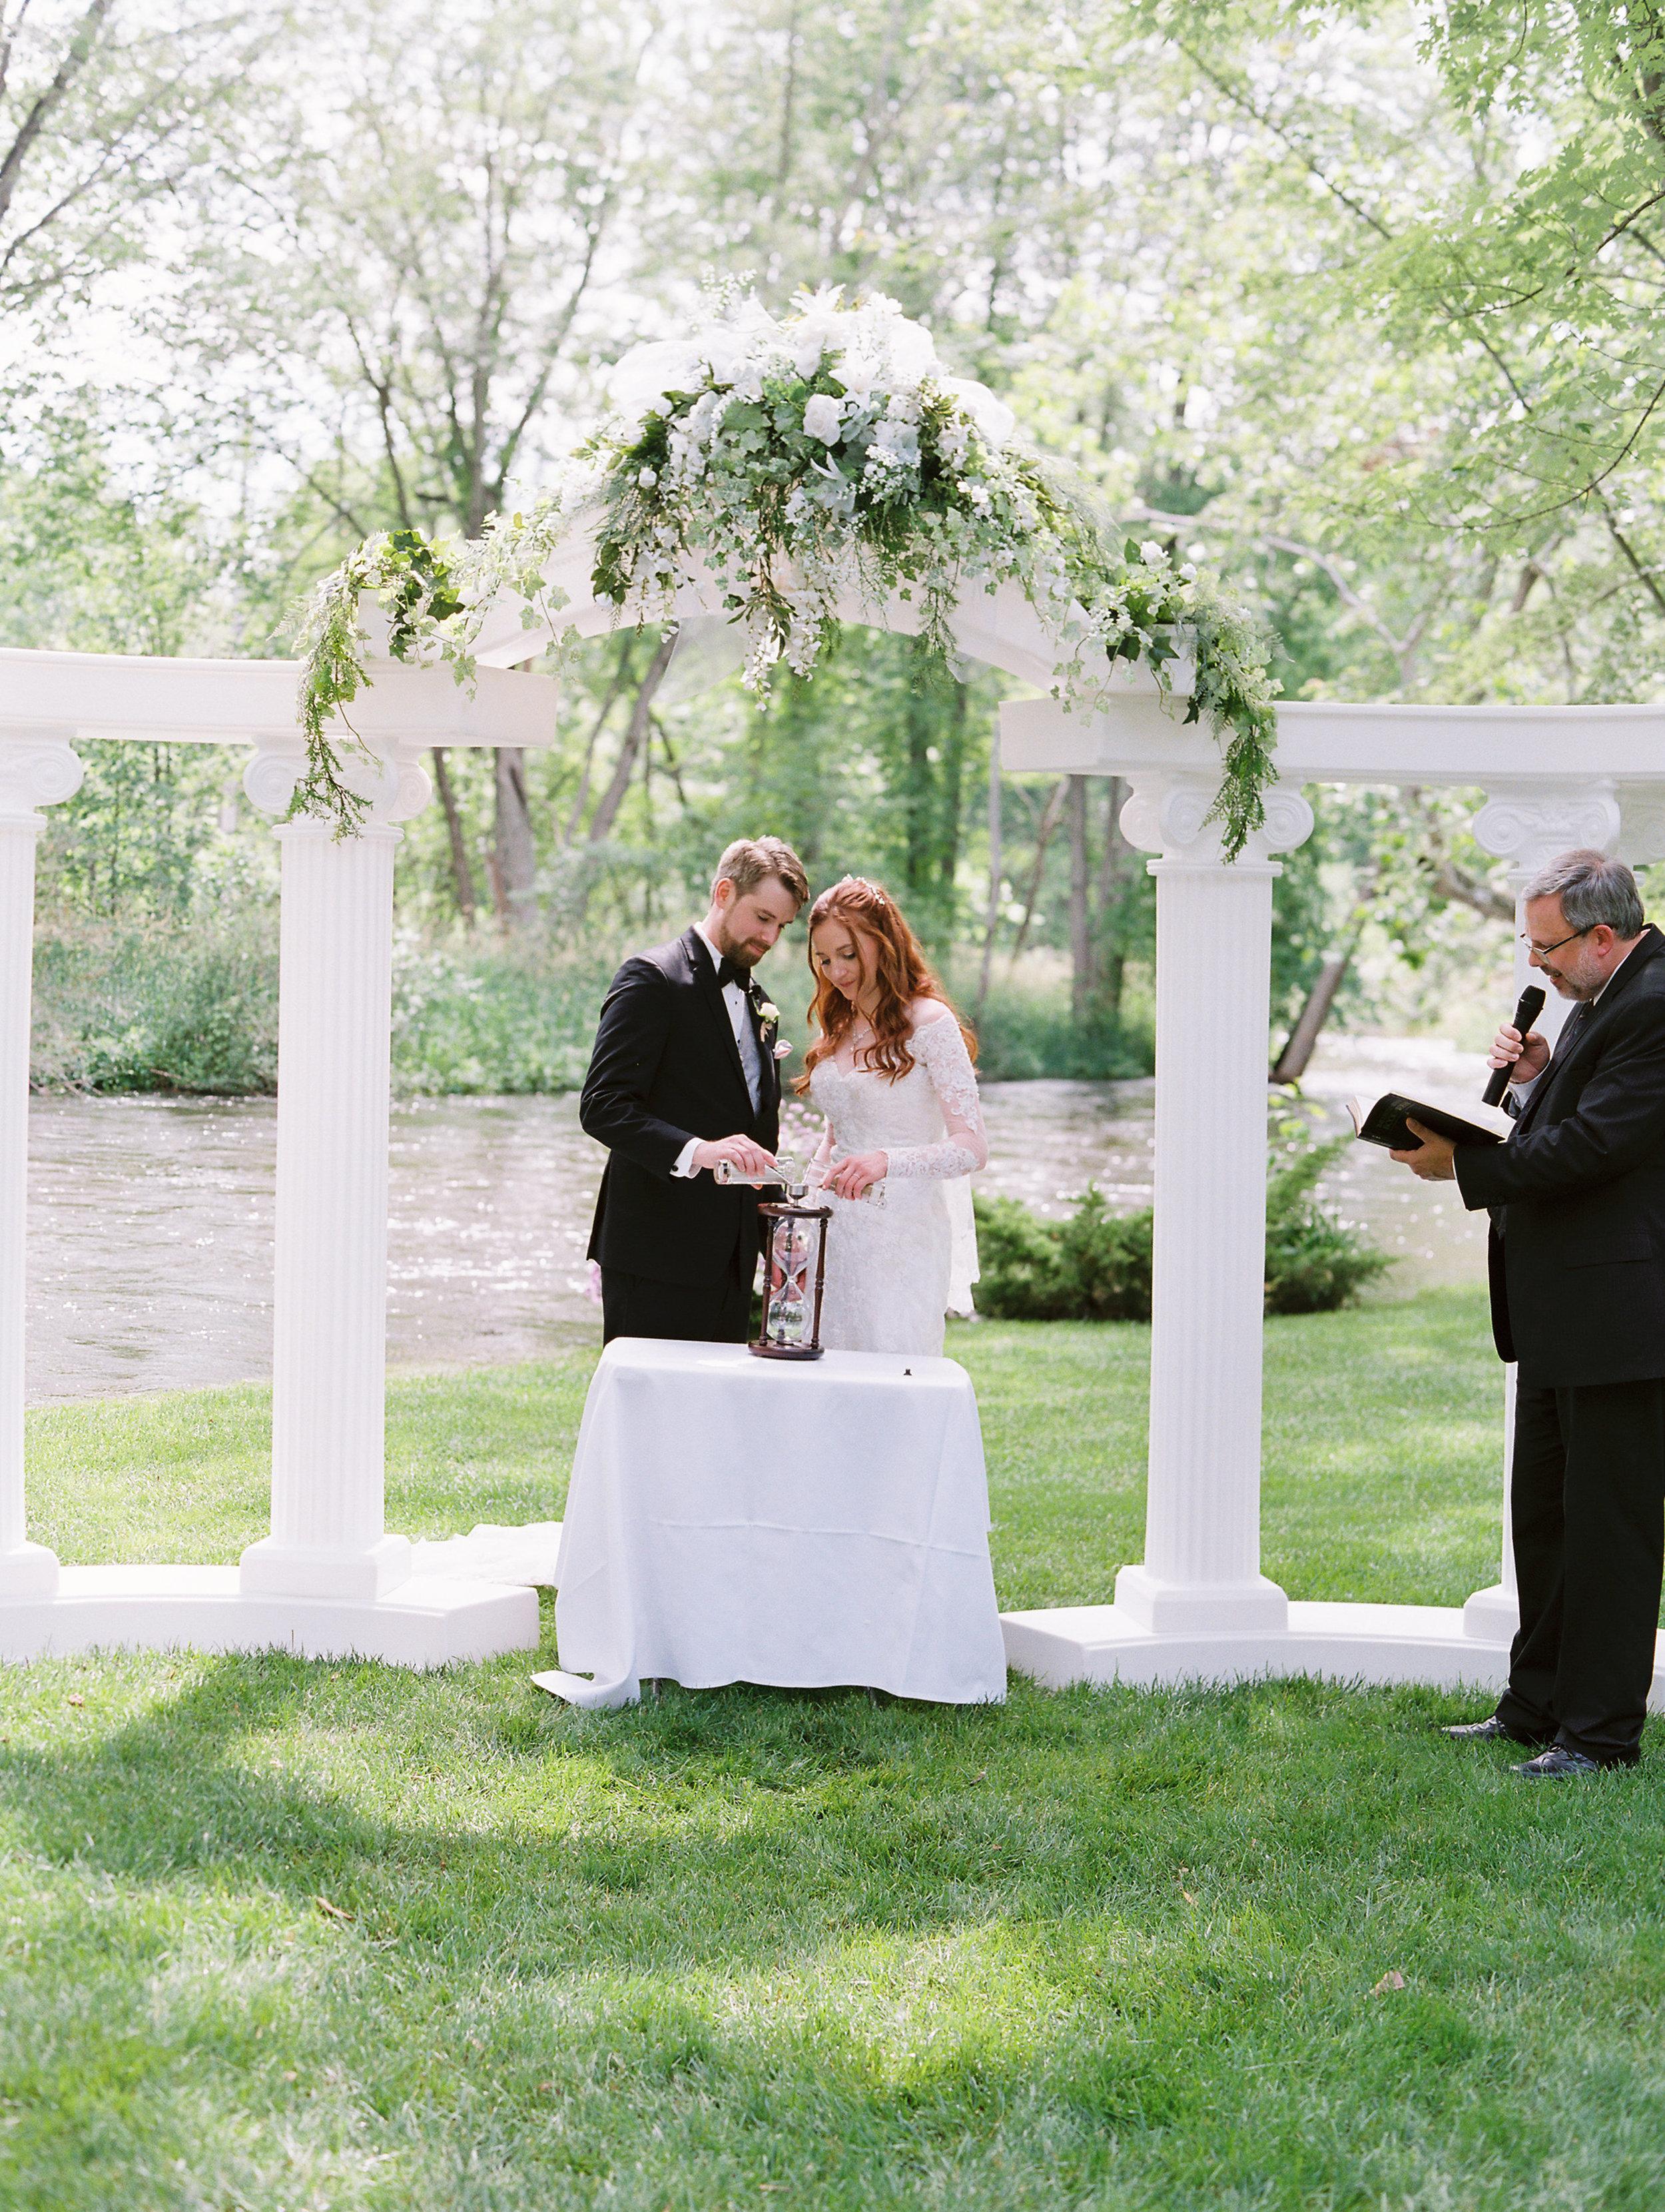 Conger+Wedding+Ceremony-110.jpg